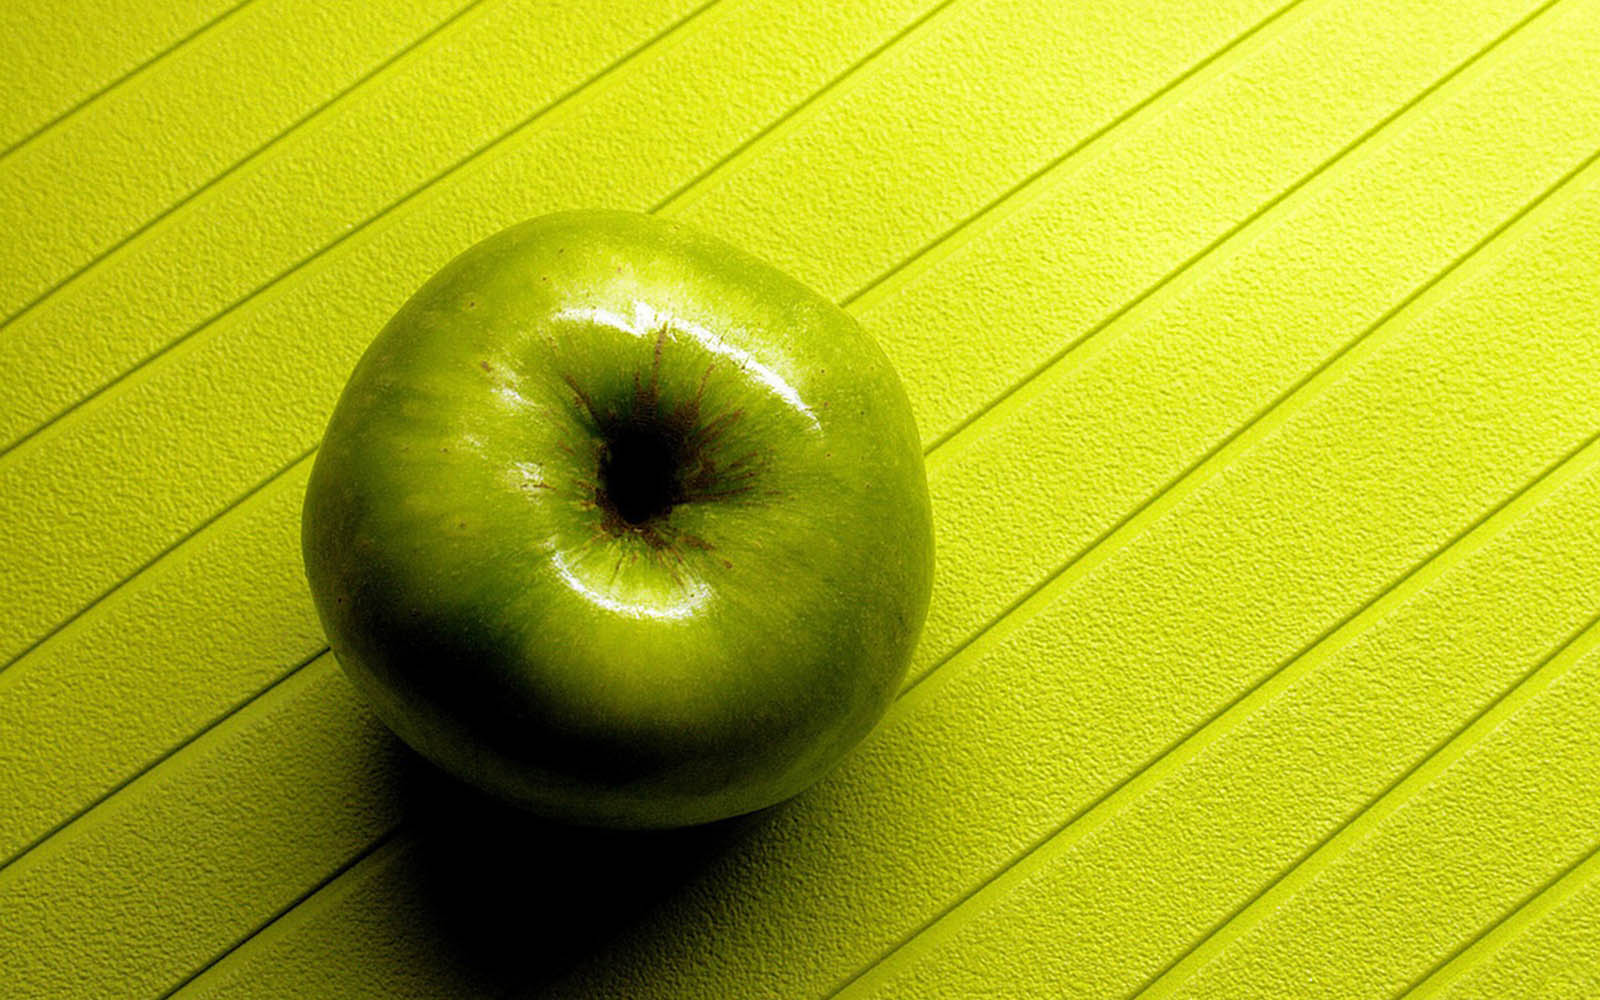 3d World Globe Wallpaper Wallpapers Green Apples Wallpapers